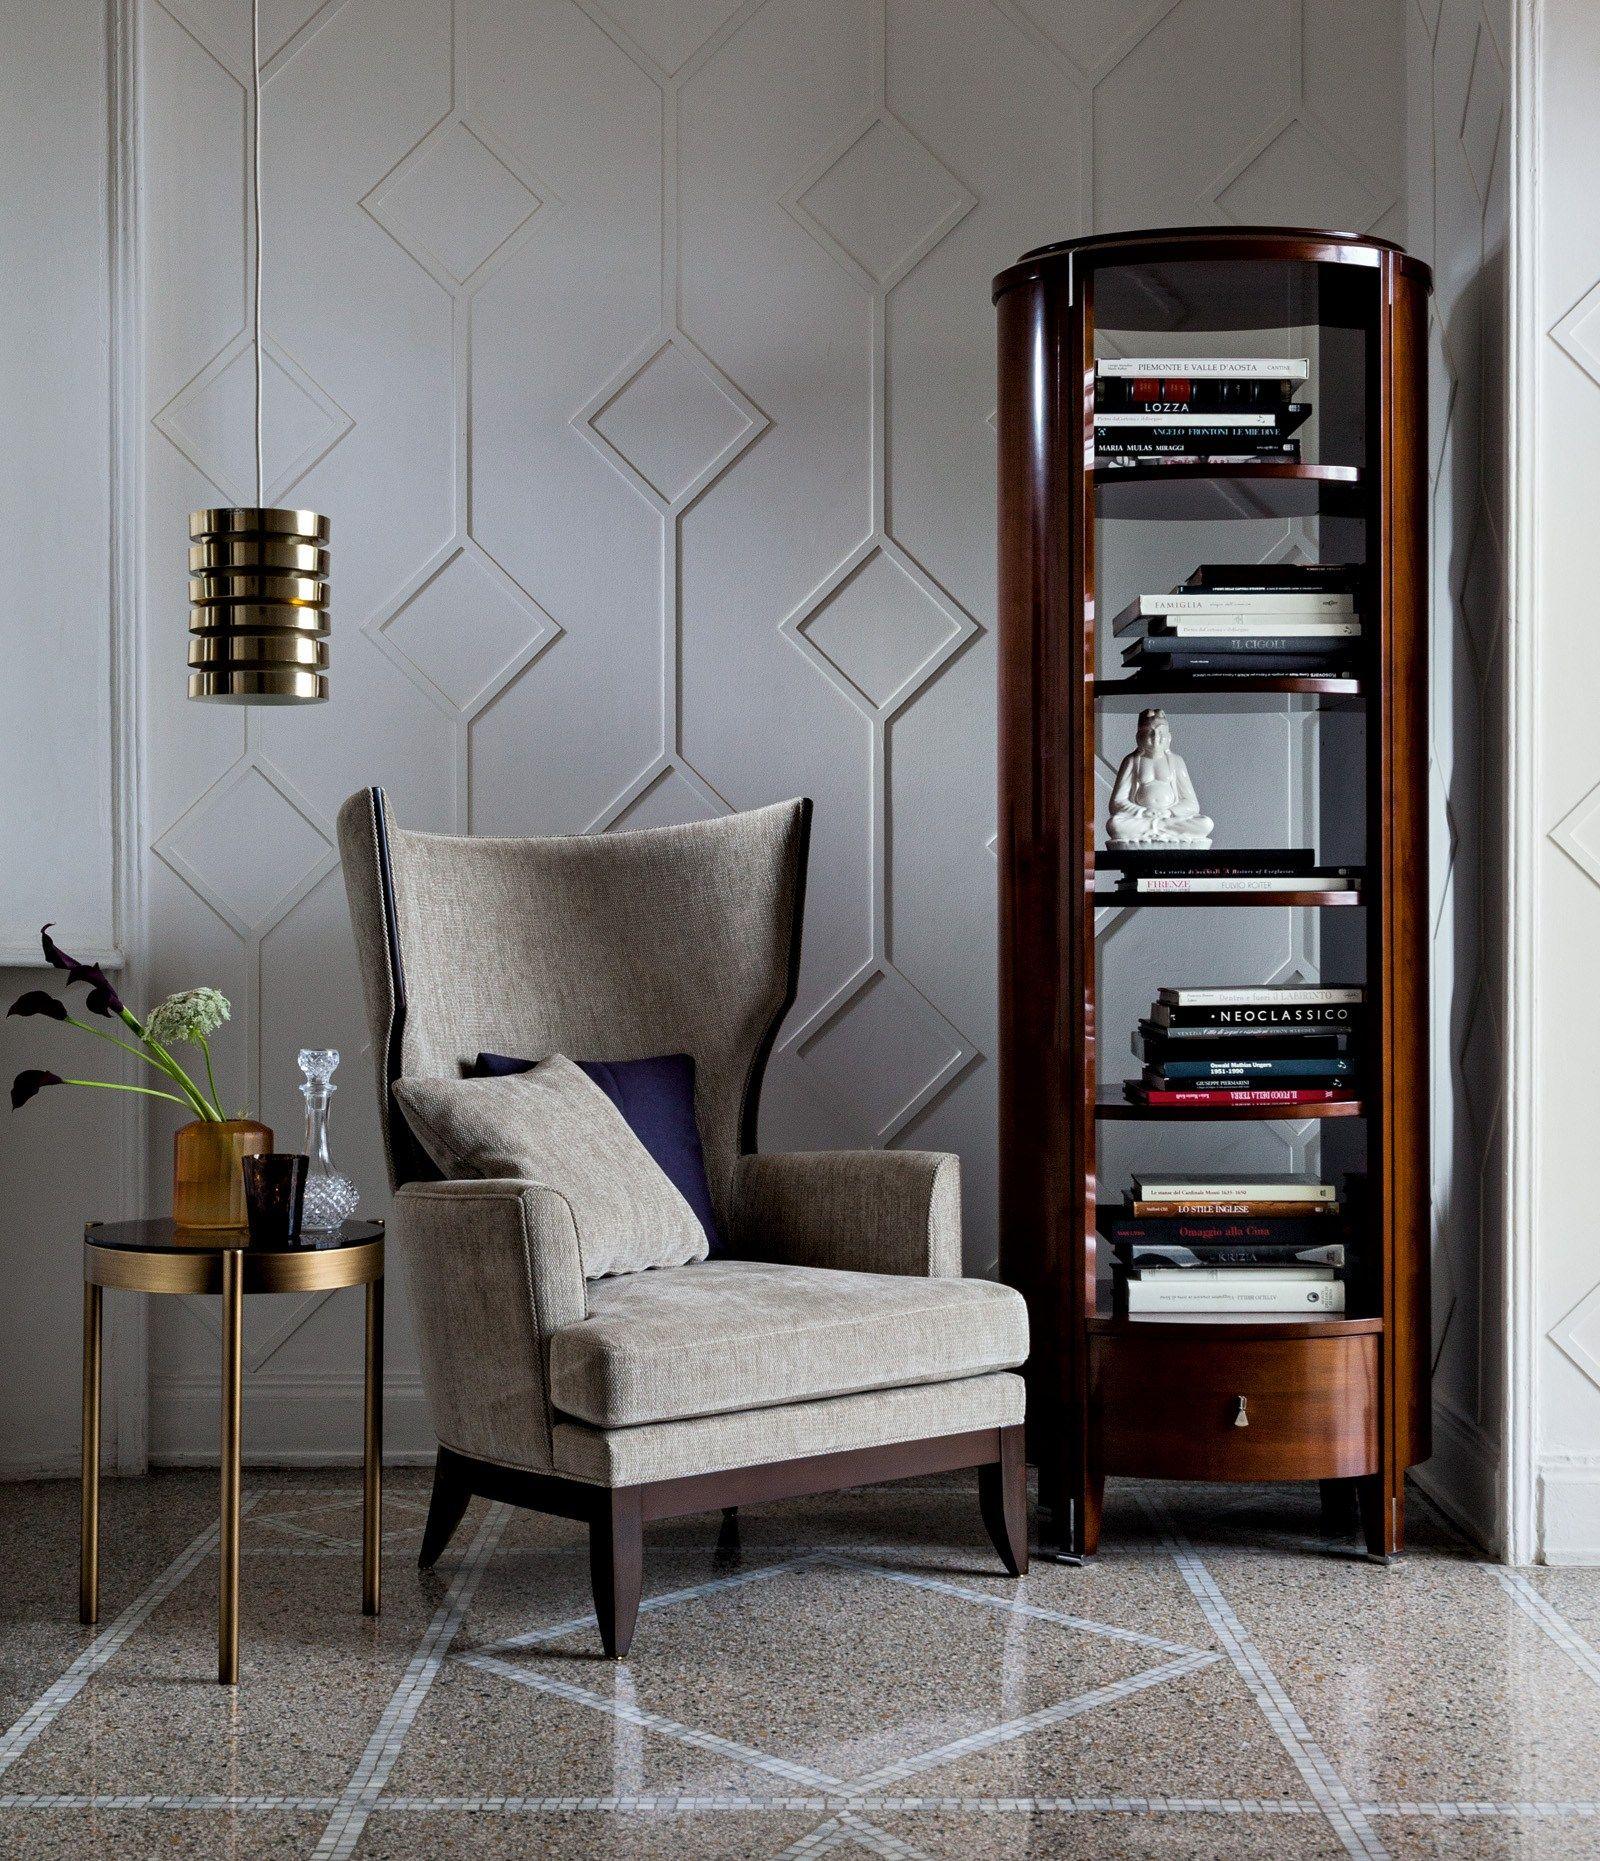 VENDÔME Bergere armchair by SELVA